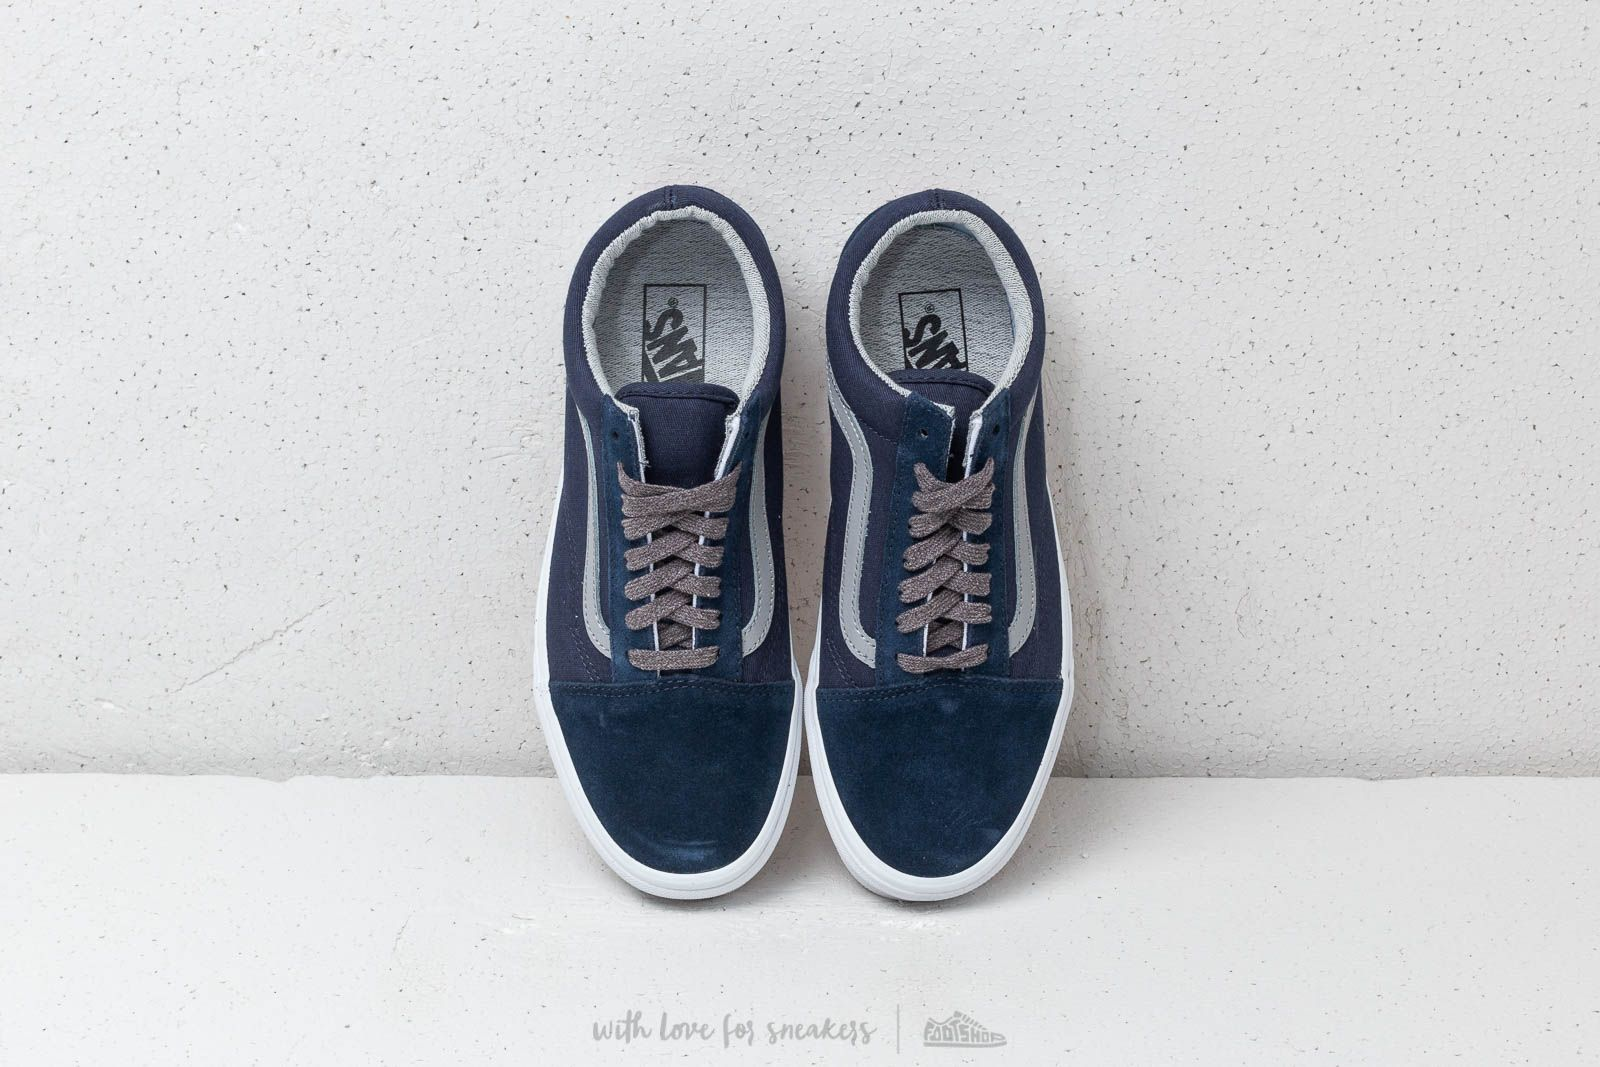 Vans Old Skool (Jersey Lace) Dress Blues Gray | Footshop